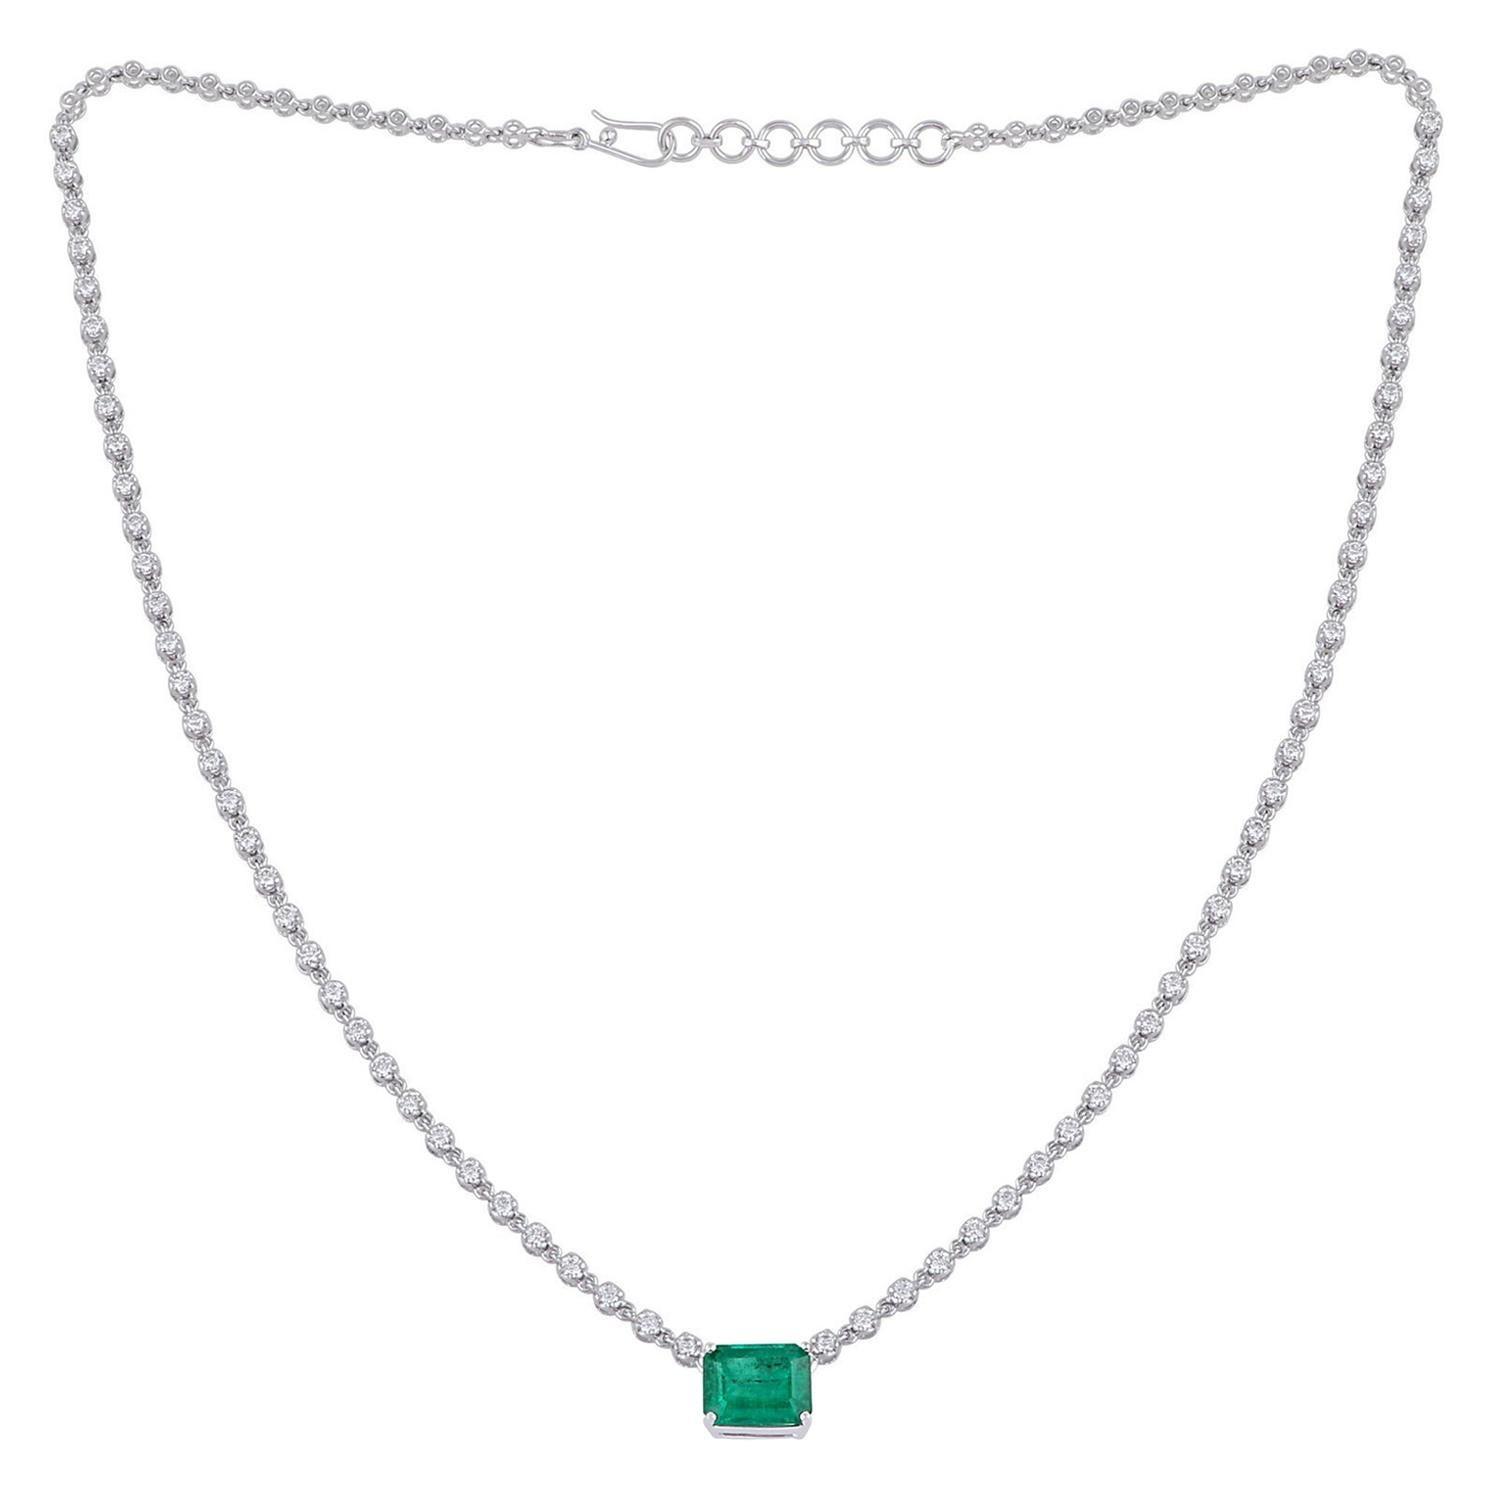 2.86 Carat Emerald 18 Karat White Gold Diamond Choker Necklace